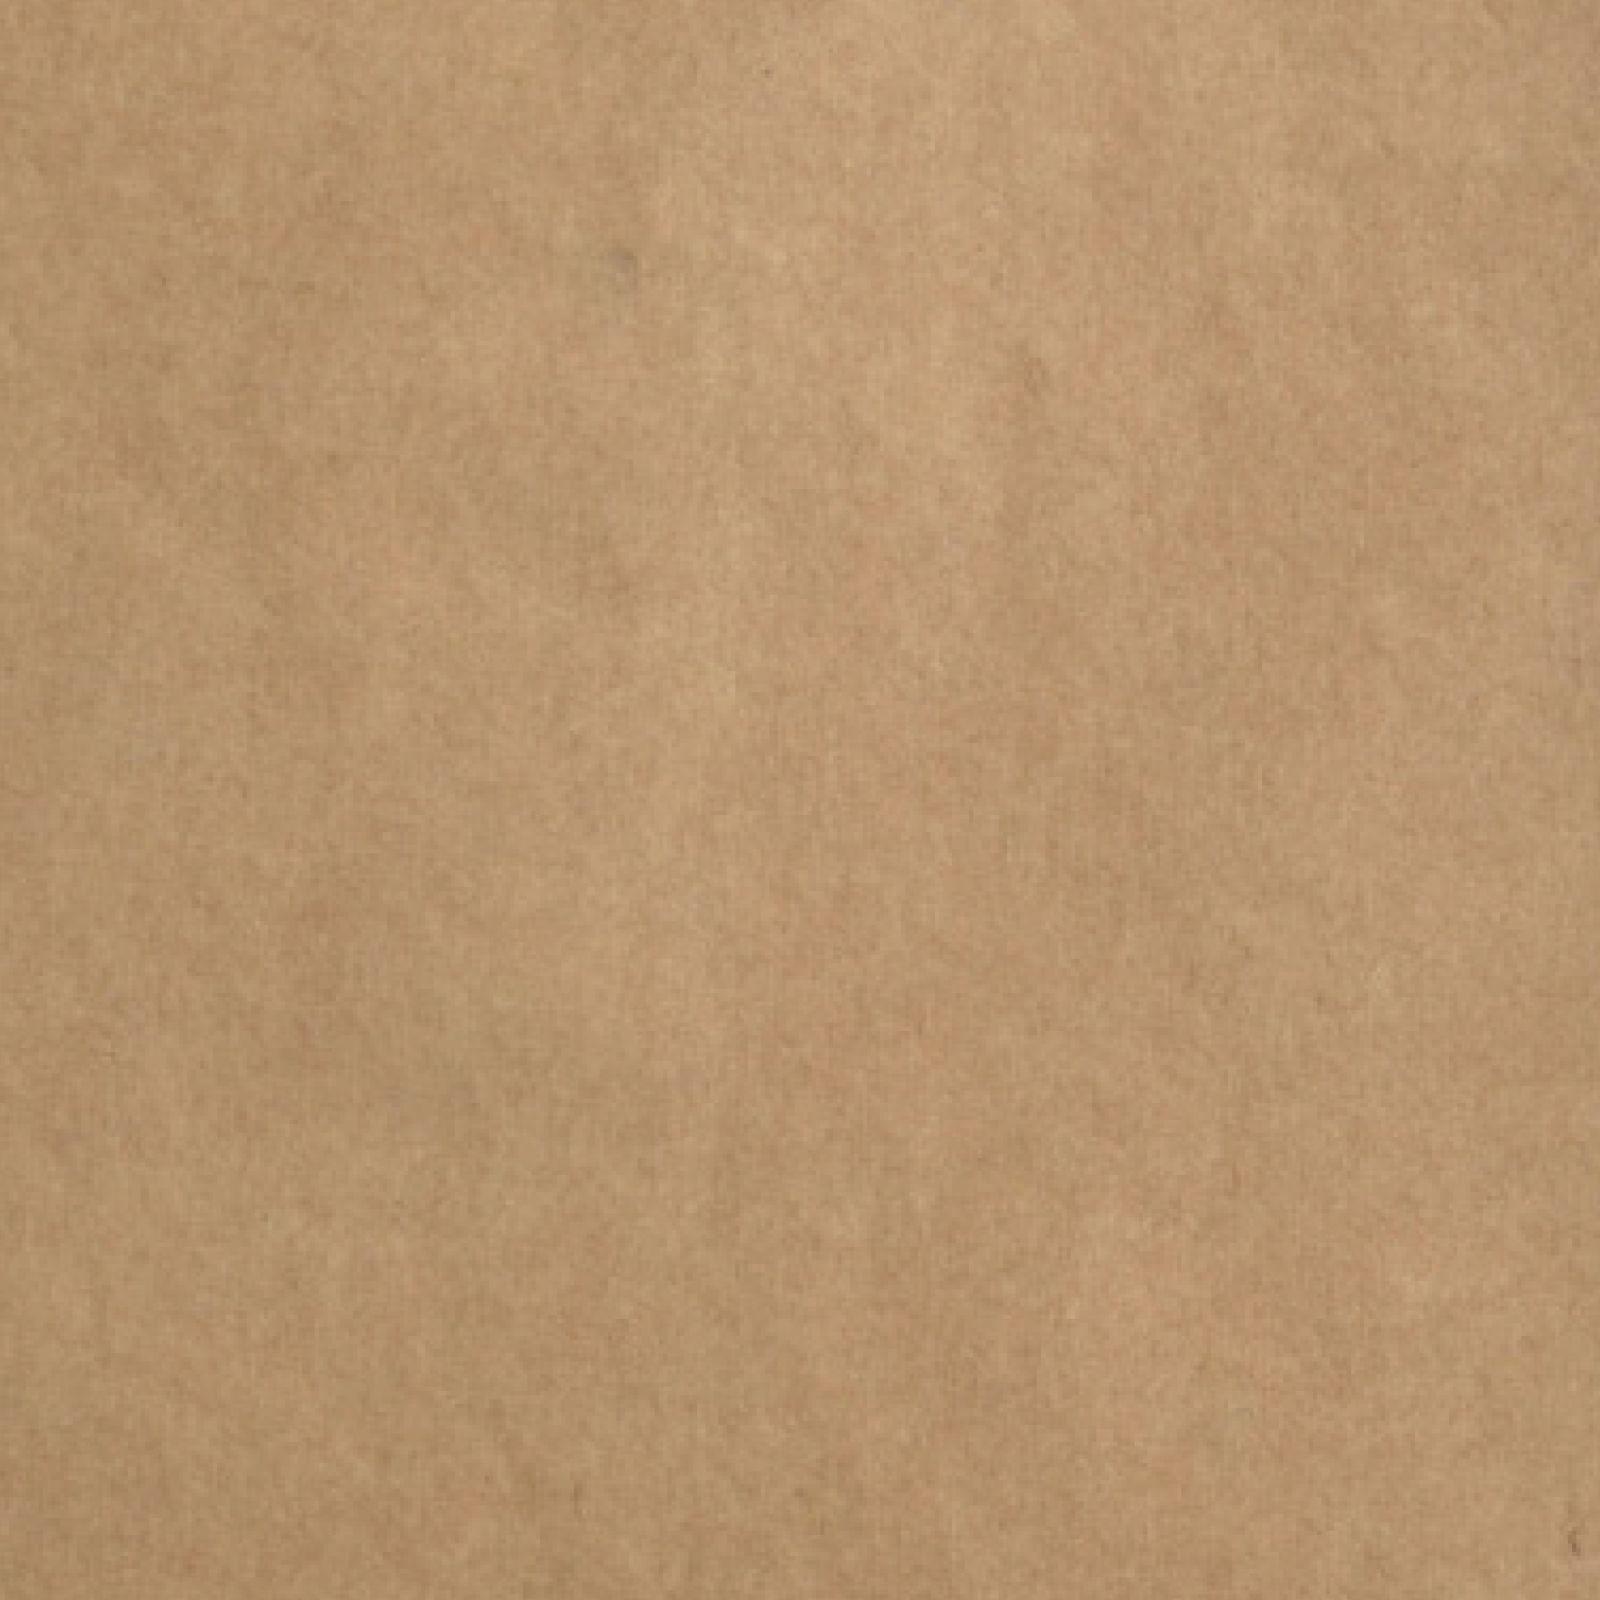 Vaessen Creative - Kraft board 2mm 30,5x30,5cm 3pcs